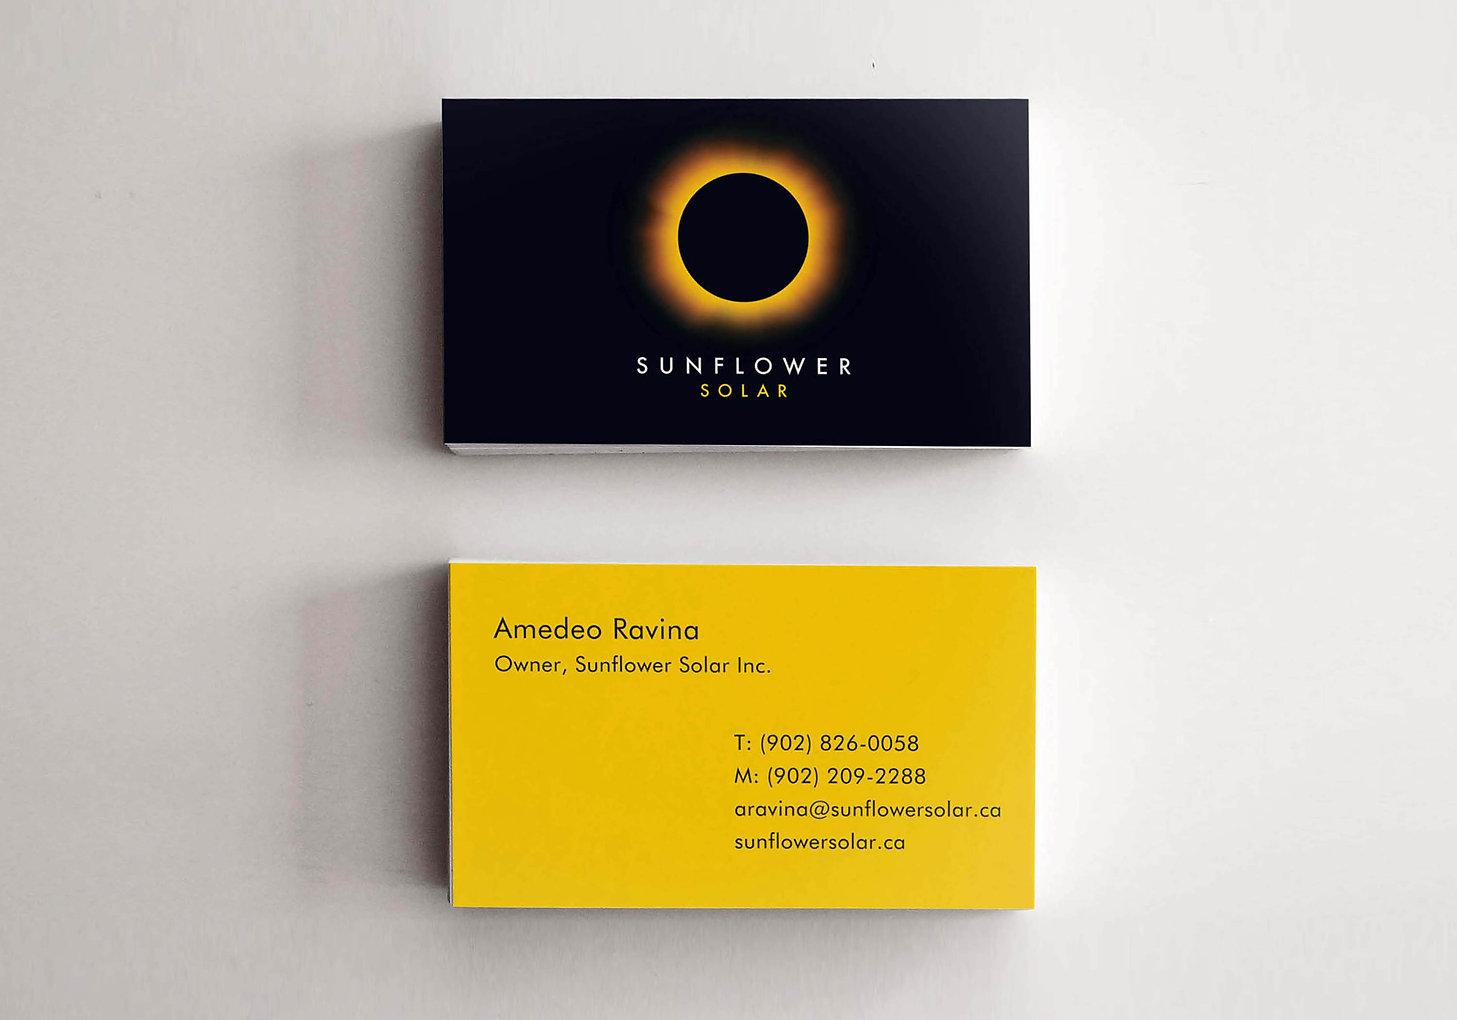 Sunflower Solar